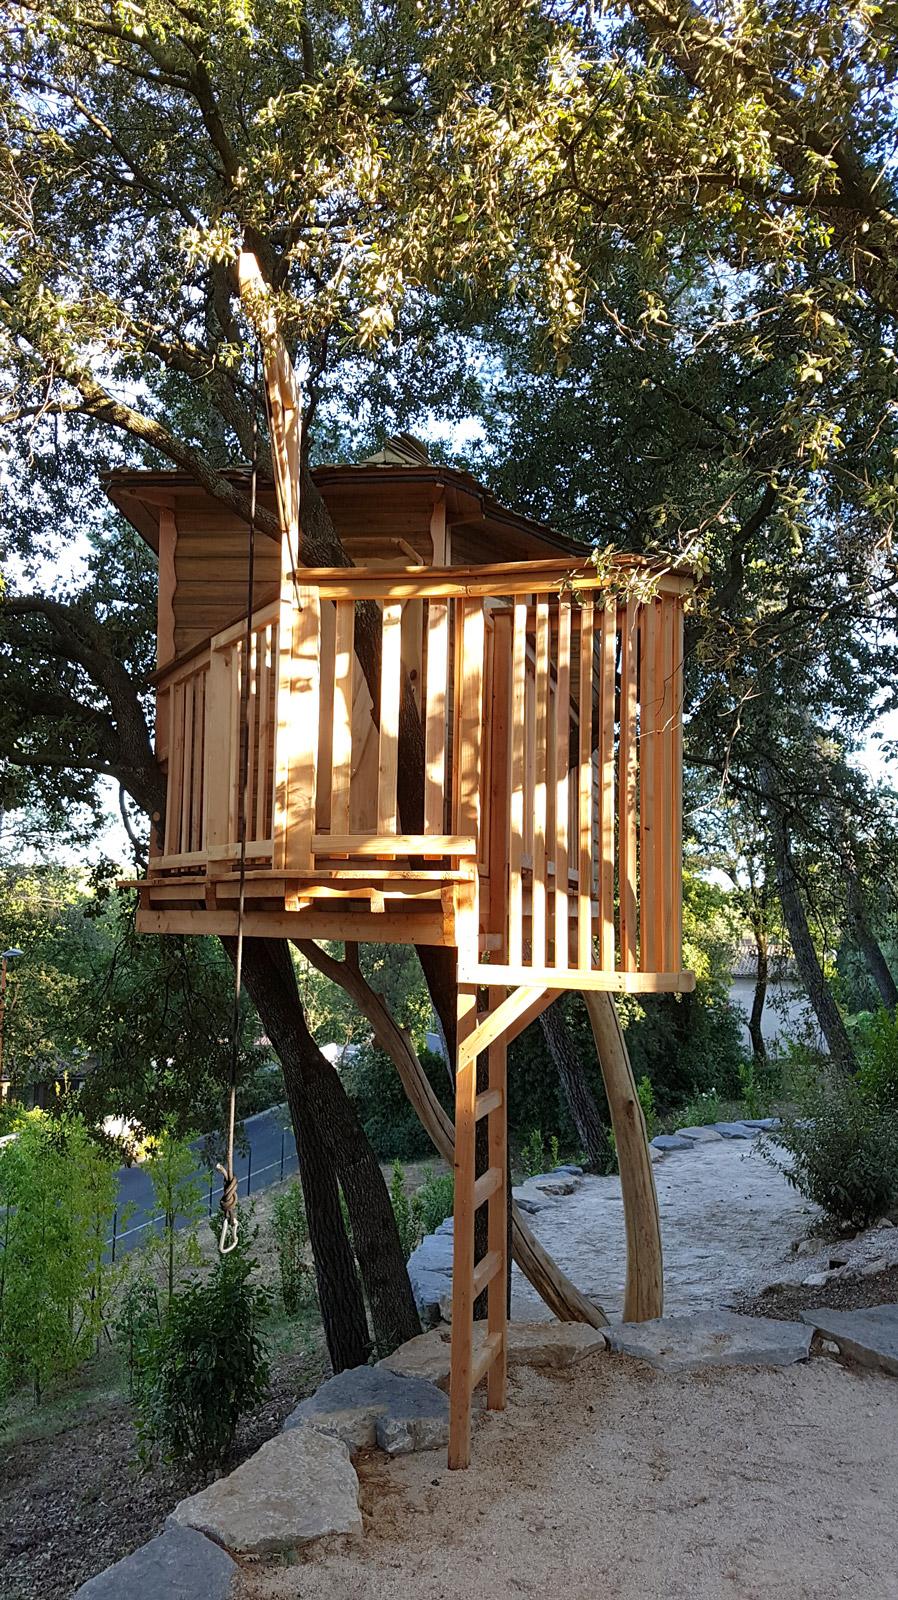 cabane d tente arbre habitat. Black Bedroom Furniture Sets. Home Design Ideas